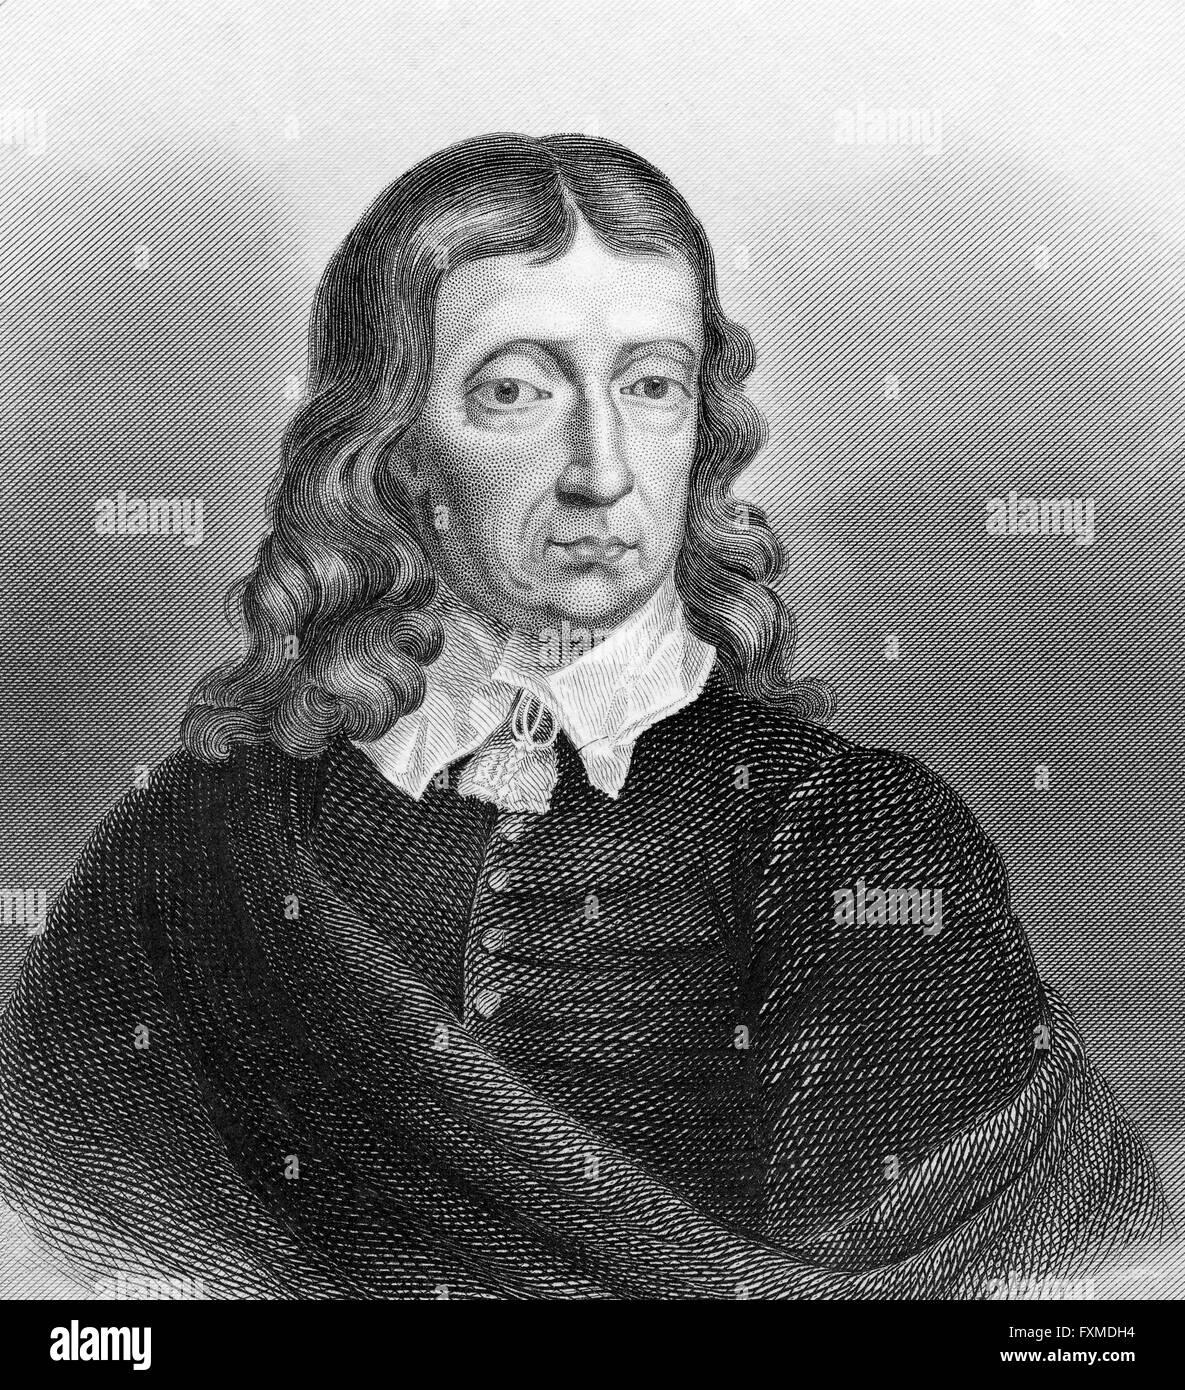 John Milton, 1608 - 1674, an English poet and political philosopher, - Stock Image